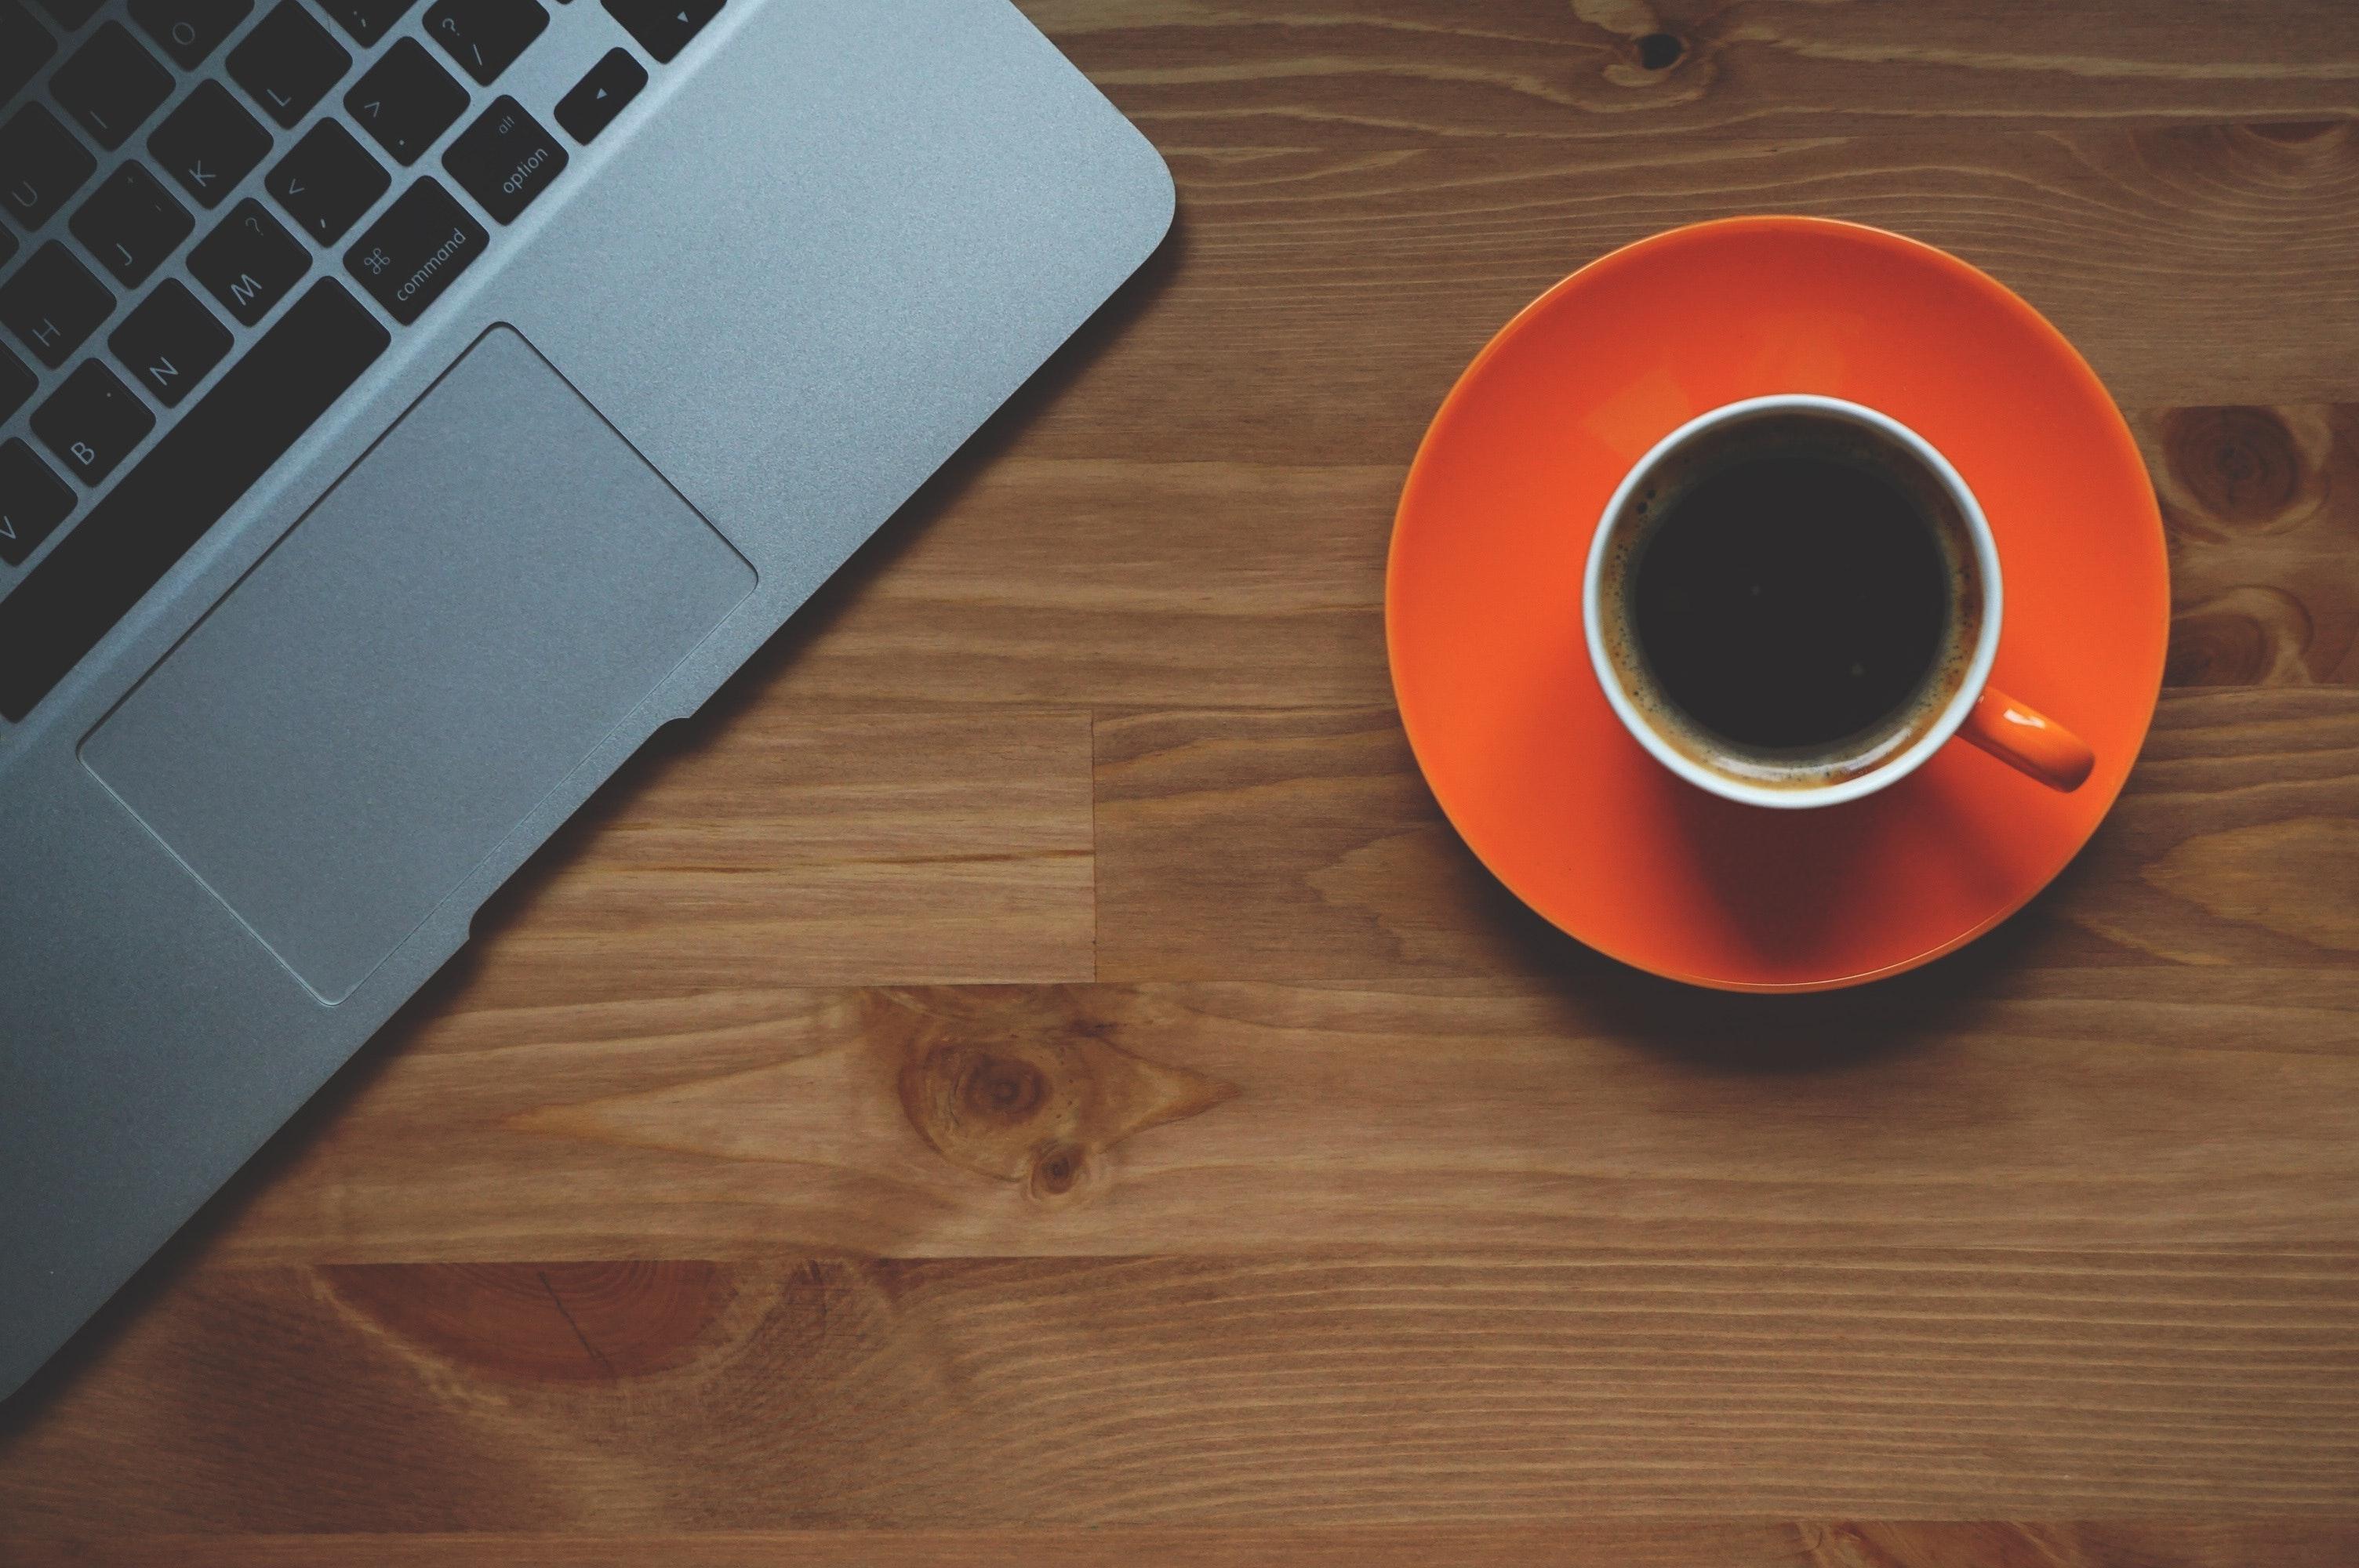 Black Coffee Filled in White Ceramic Mug on Orange Plate · Free ...